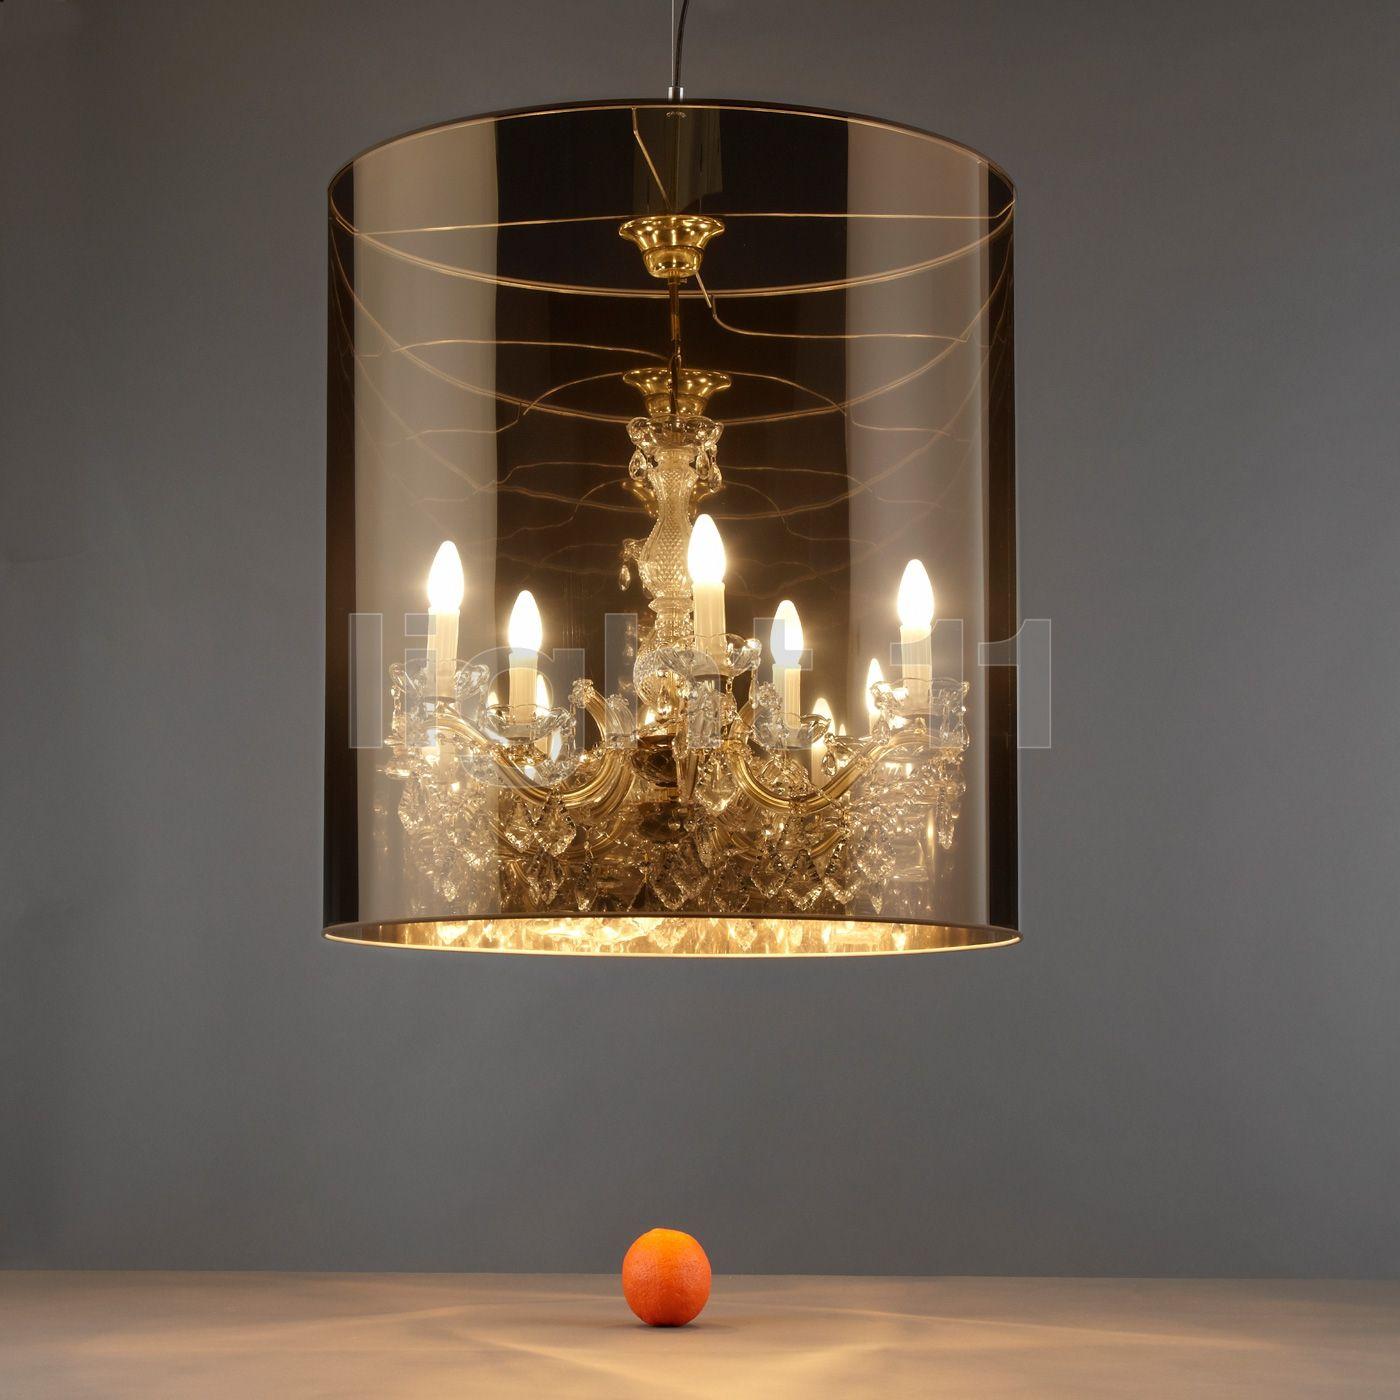 Marvelous Moooi Light Shade Shade Pendelleuchte Pendelleuchten Leuchten und Lampen light de